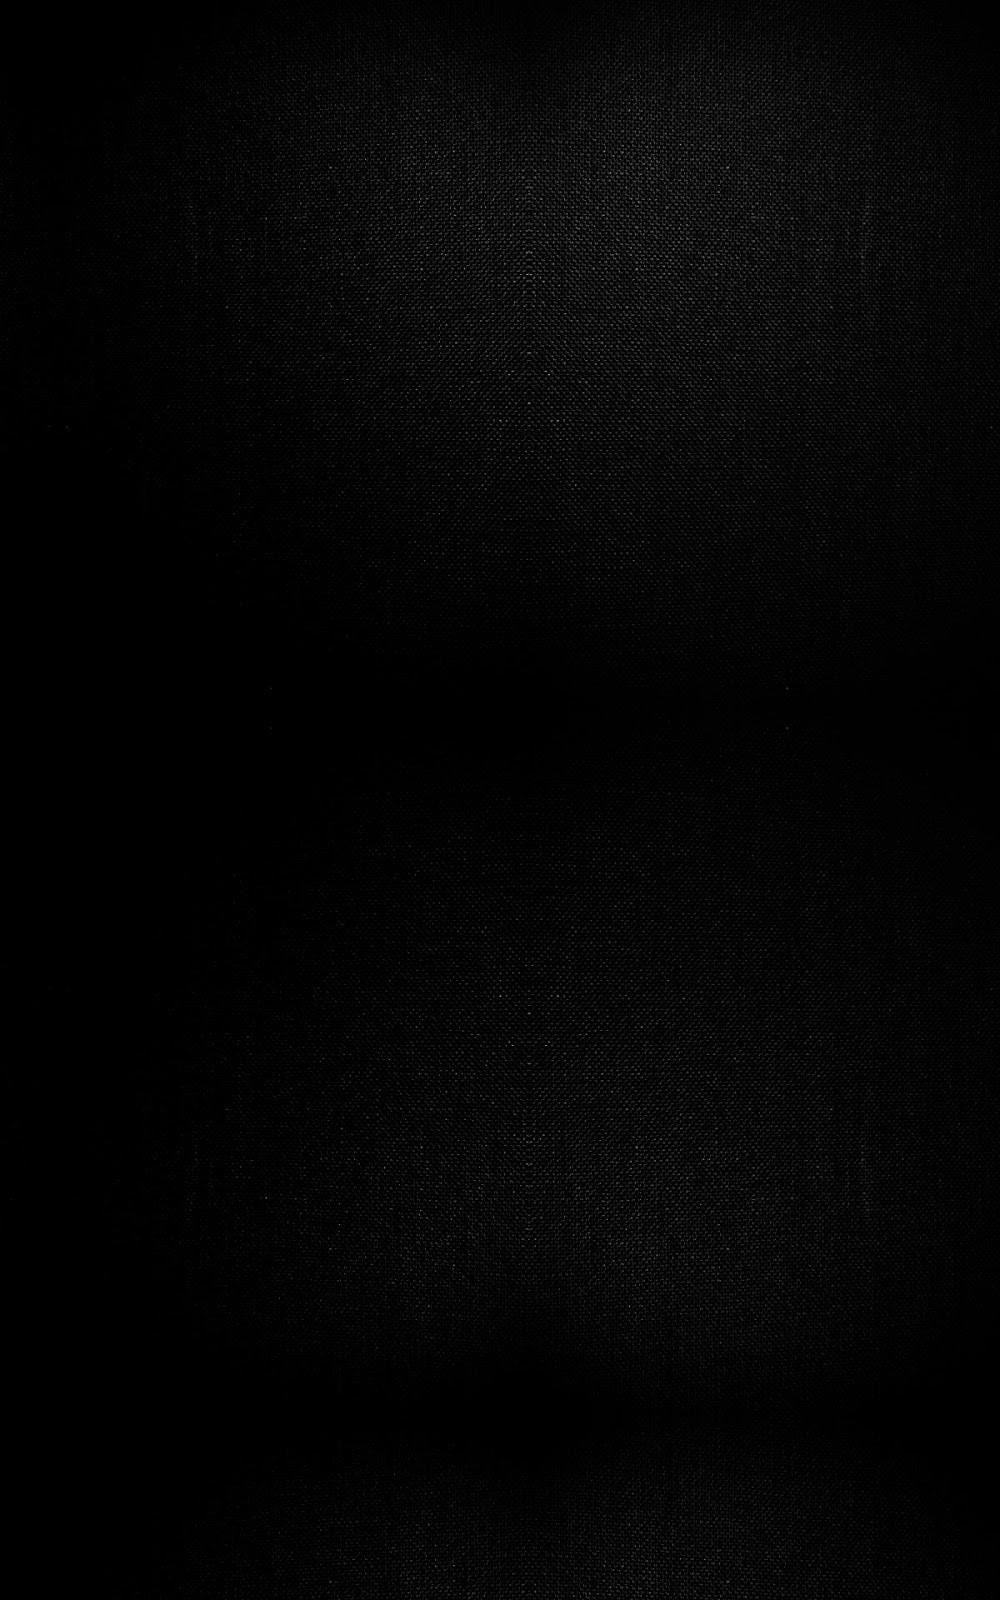 Black Background iPhone Wallpaper 2019 3D iPhone Wallpaper